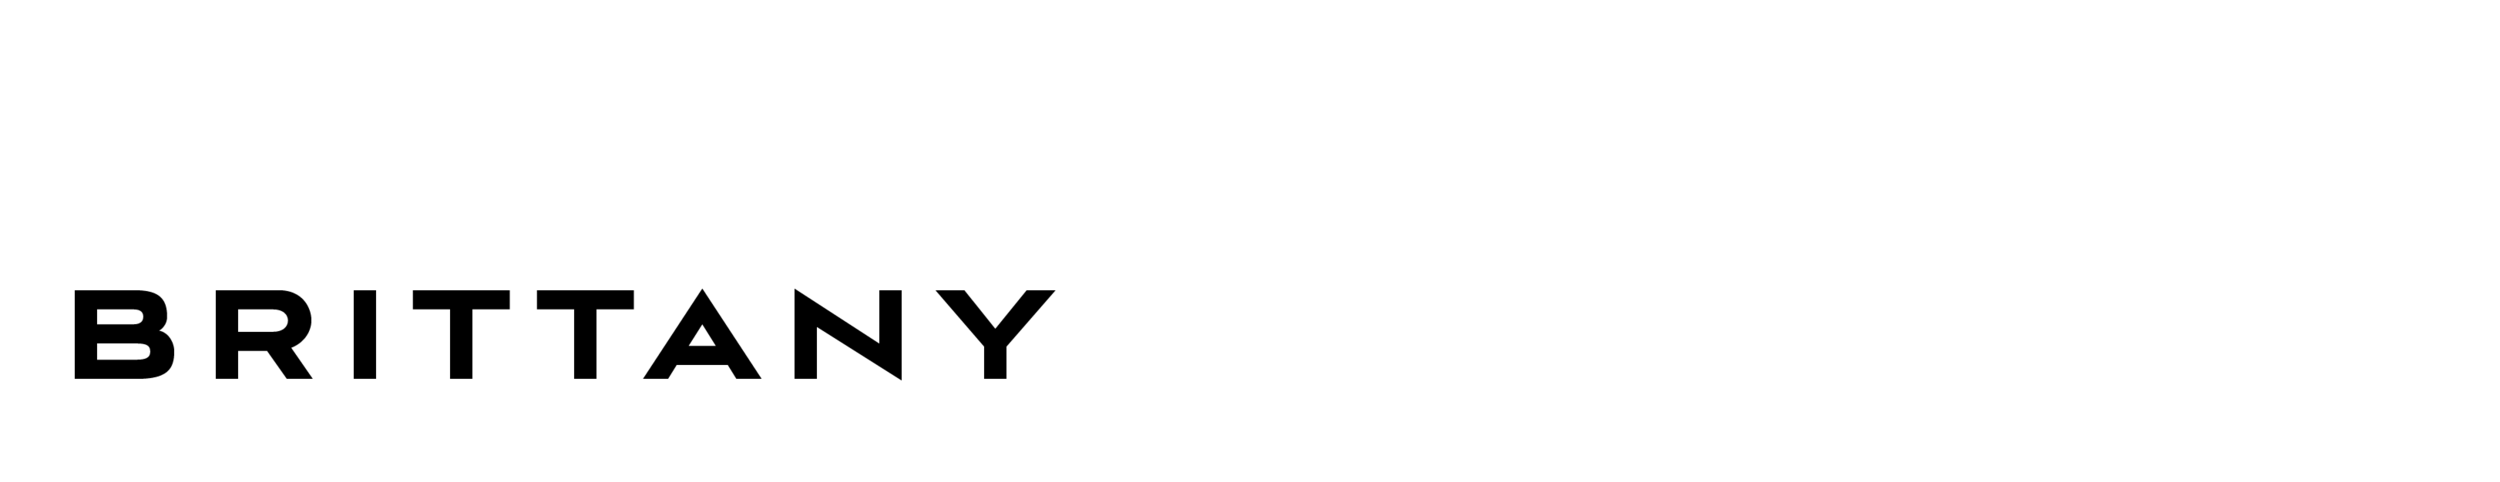 WFBrittanyClub-White-LogoType-05.png